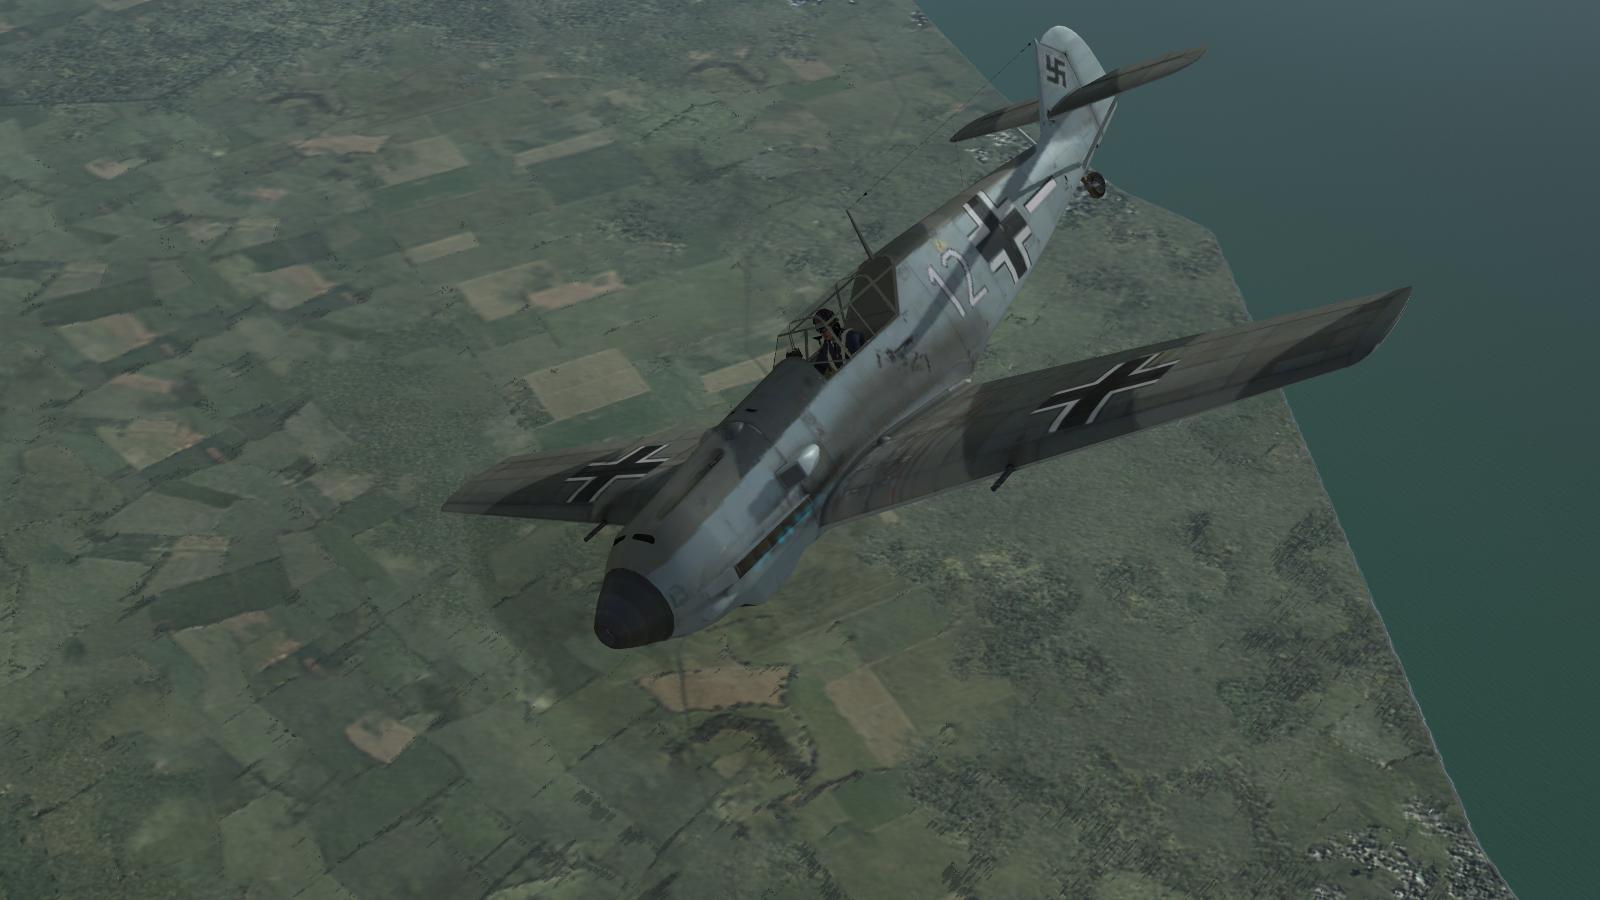 Bf109E, II/JG77, CFS3+ETO Expansion+BoB campaign escort mission, July 1940